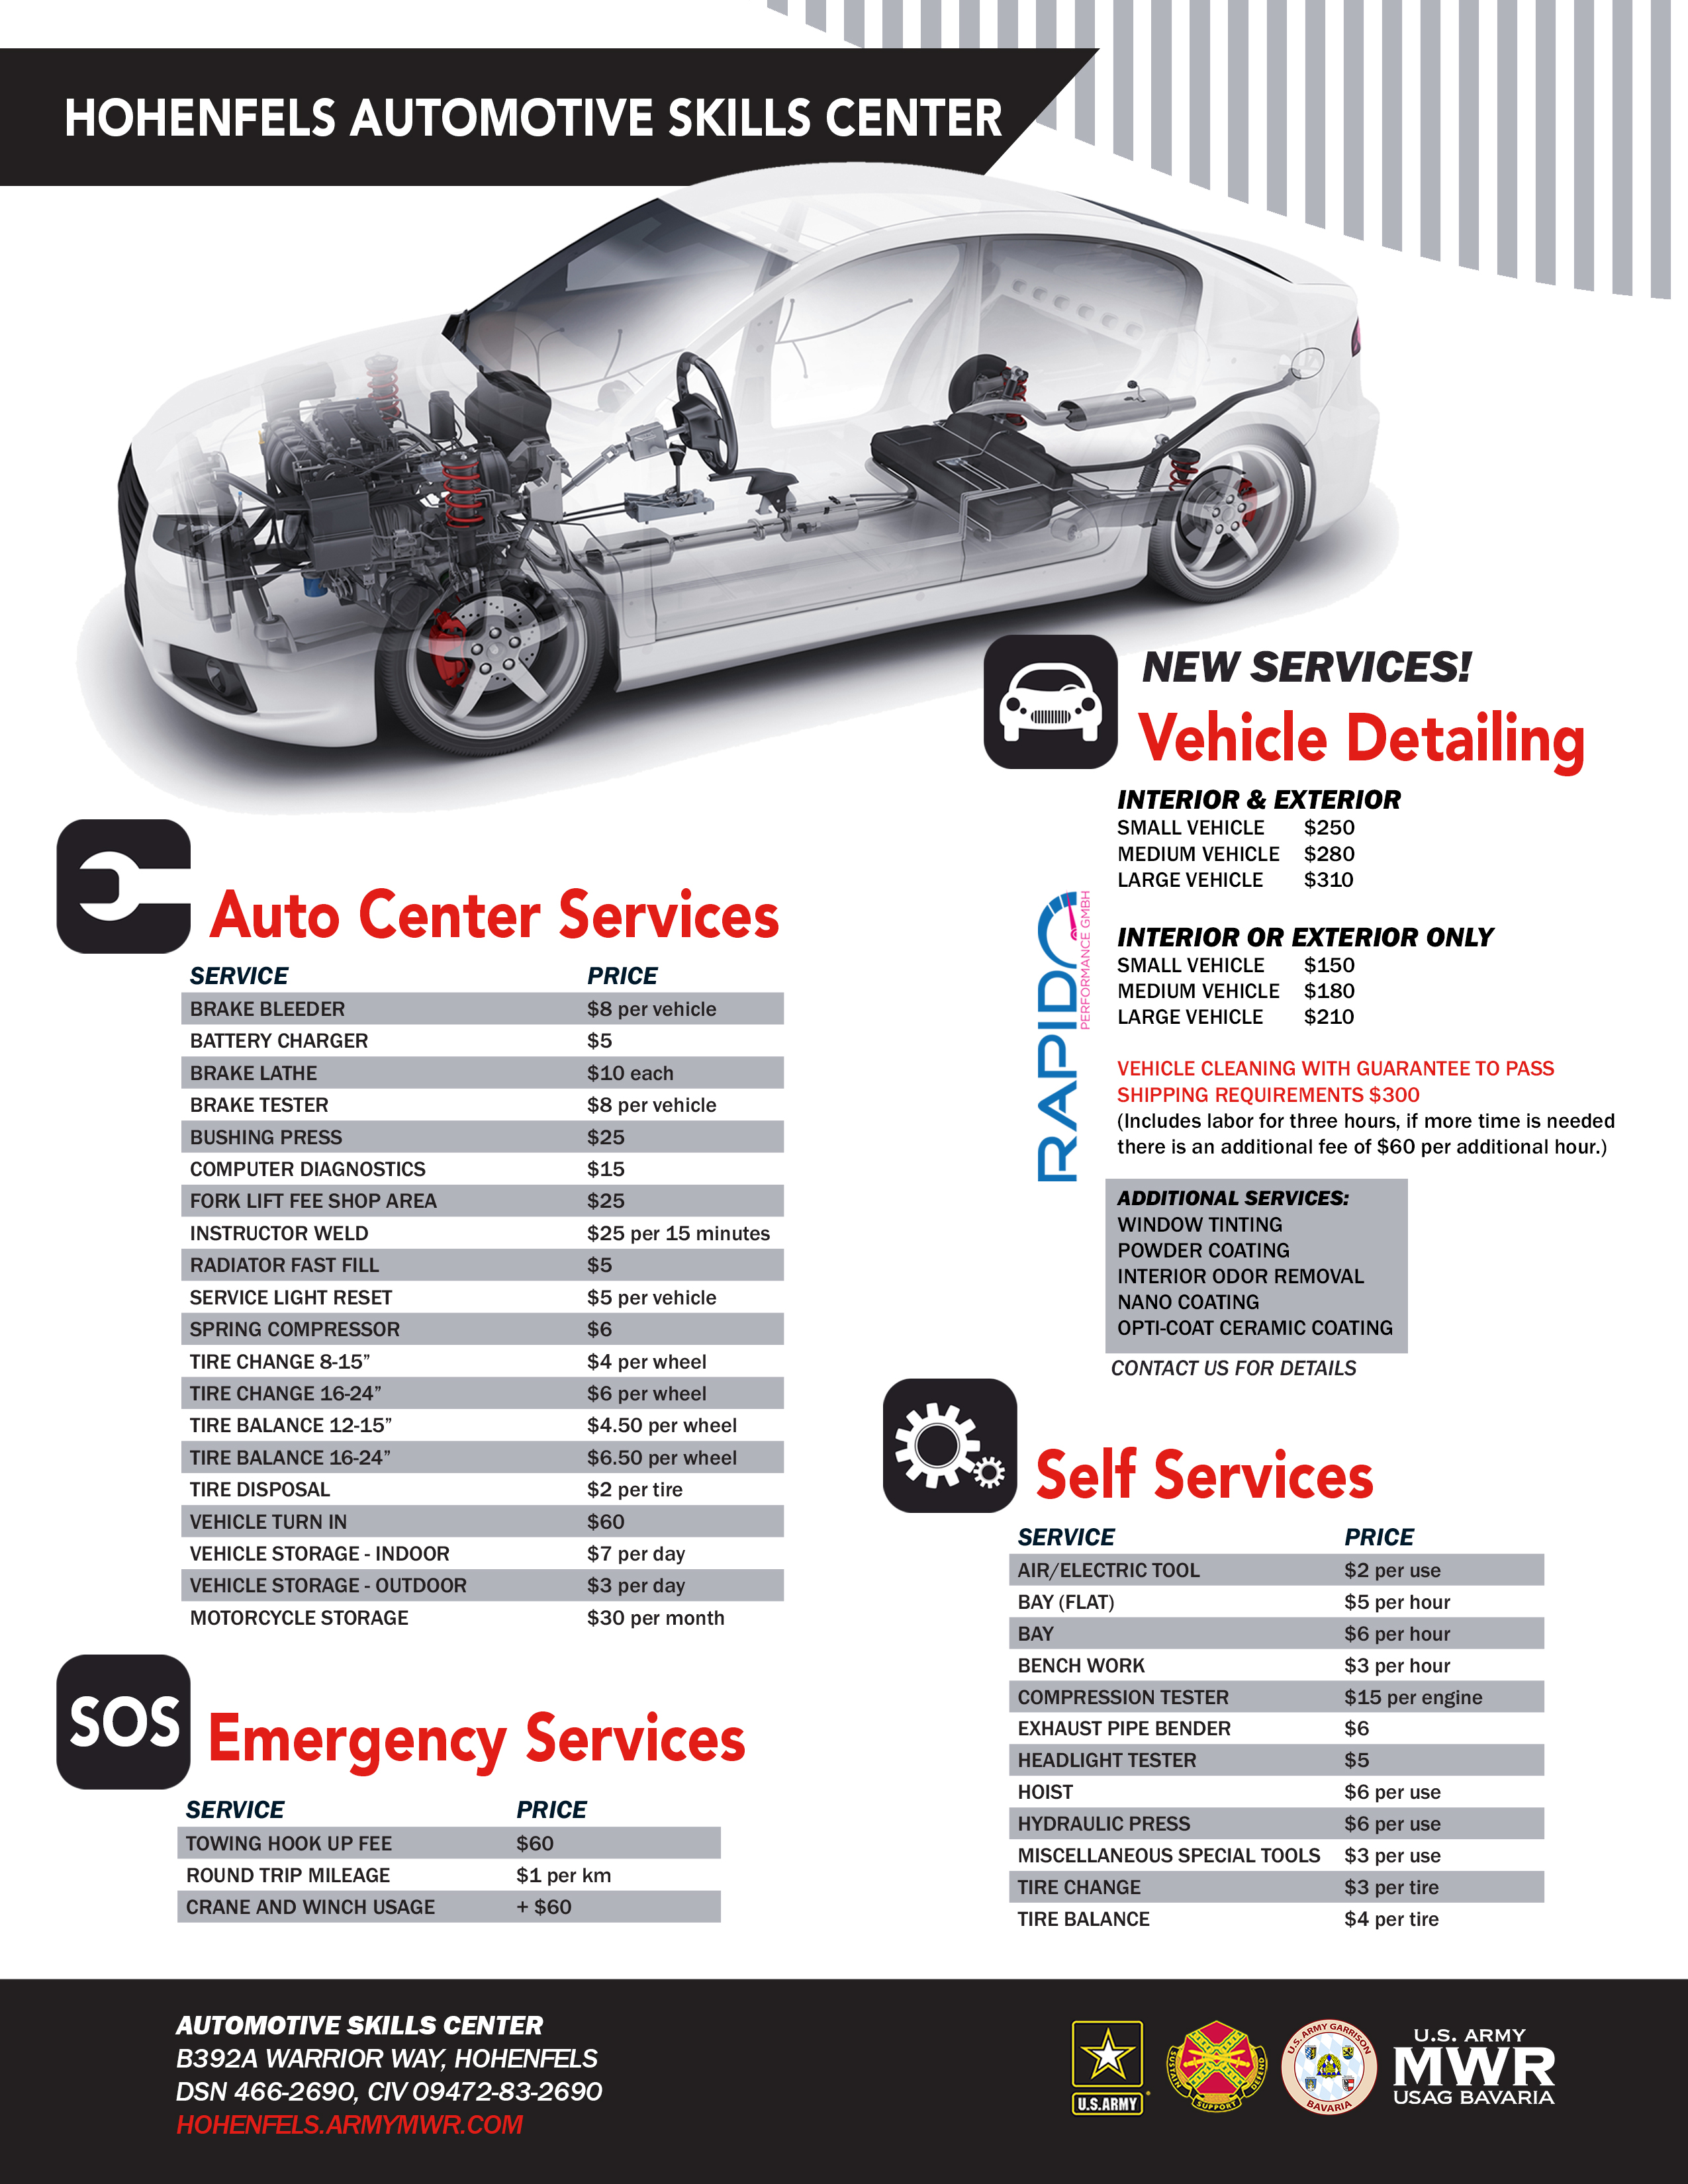 US Army MWR Automotive Skills Center